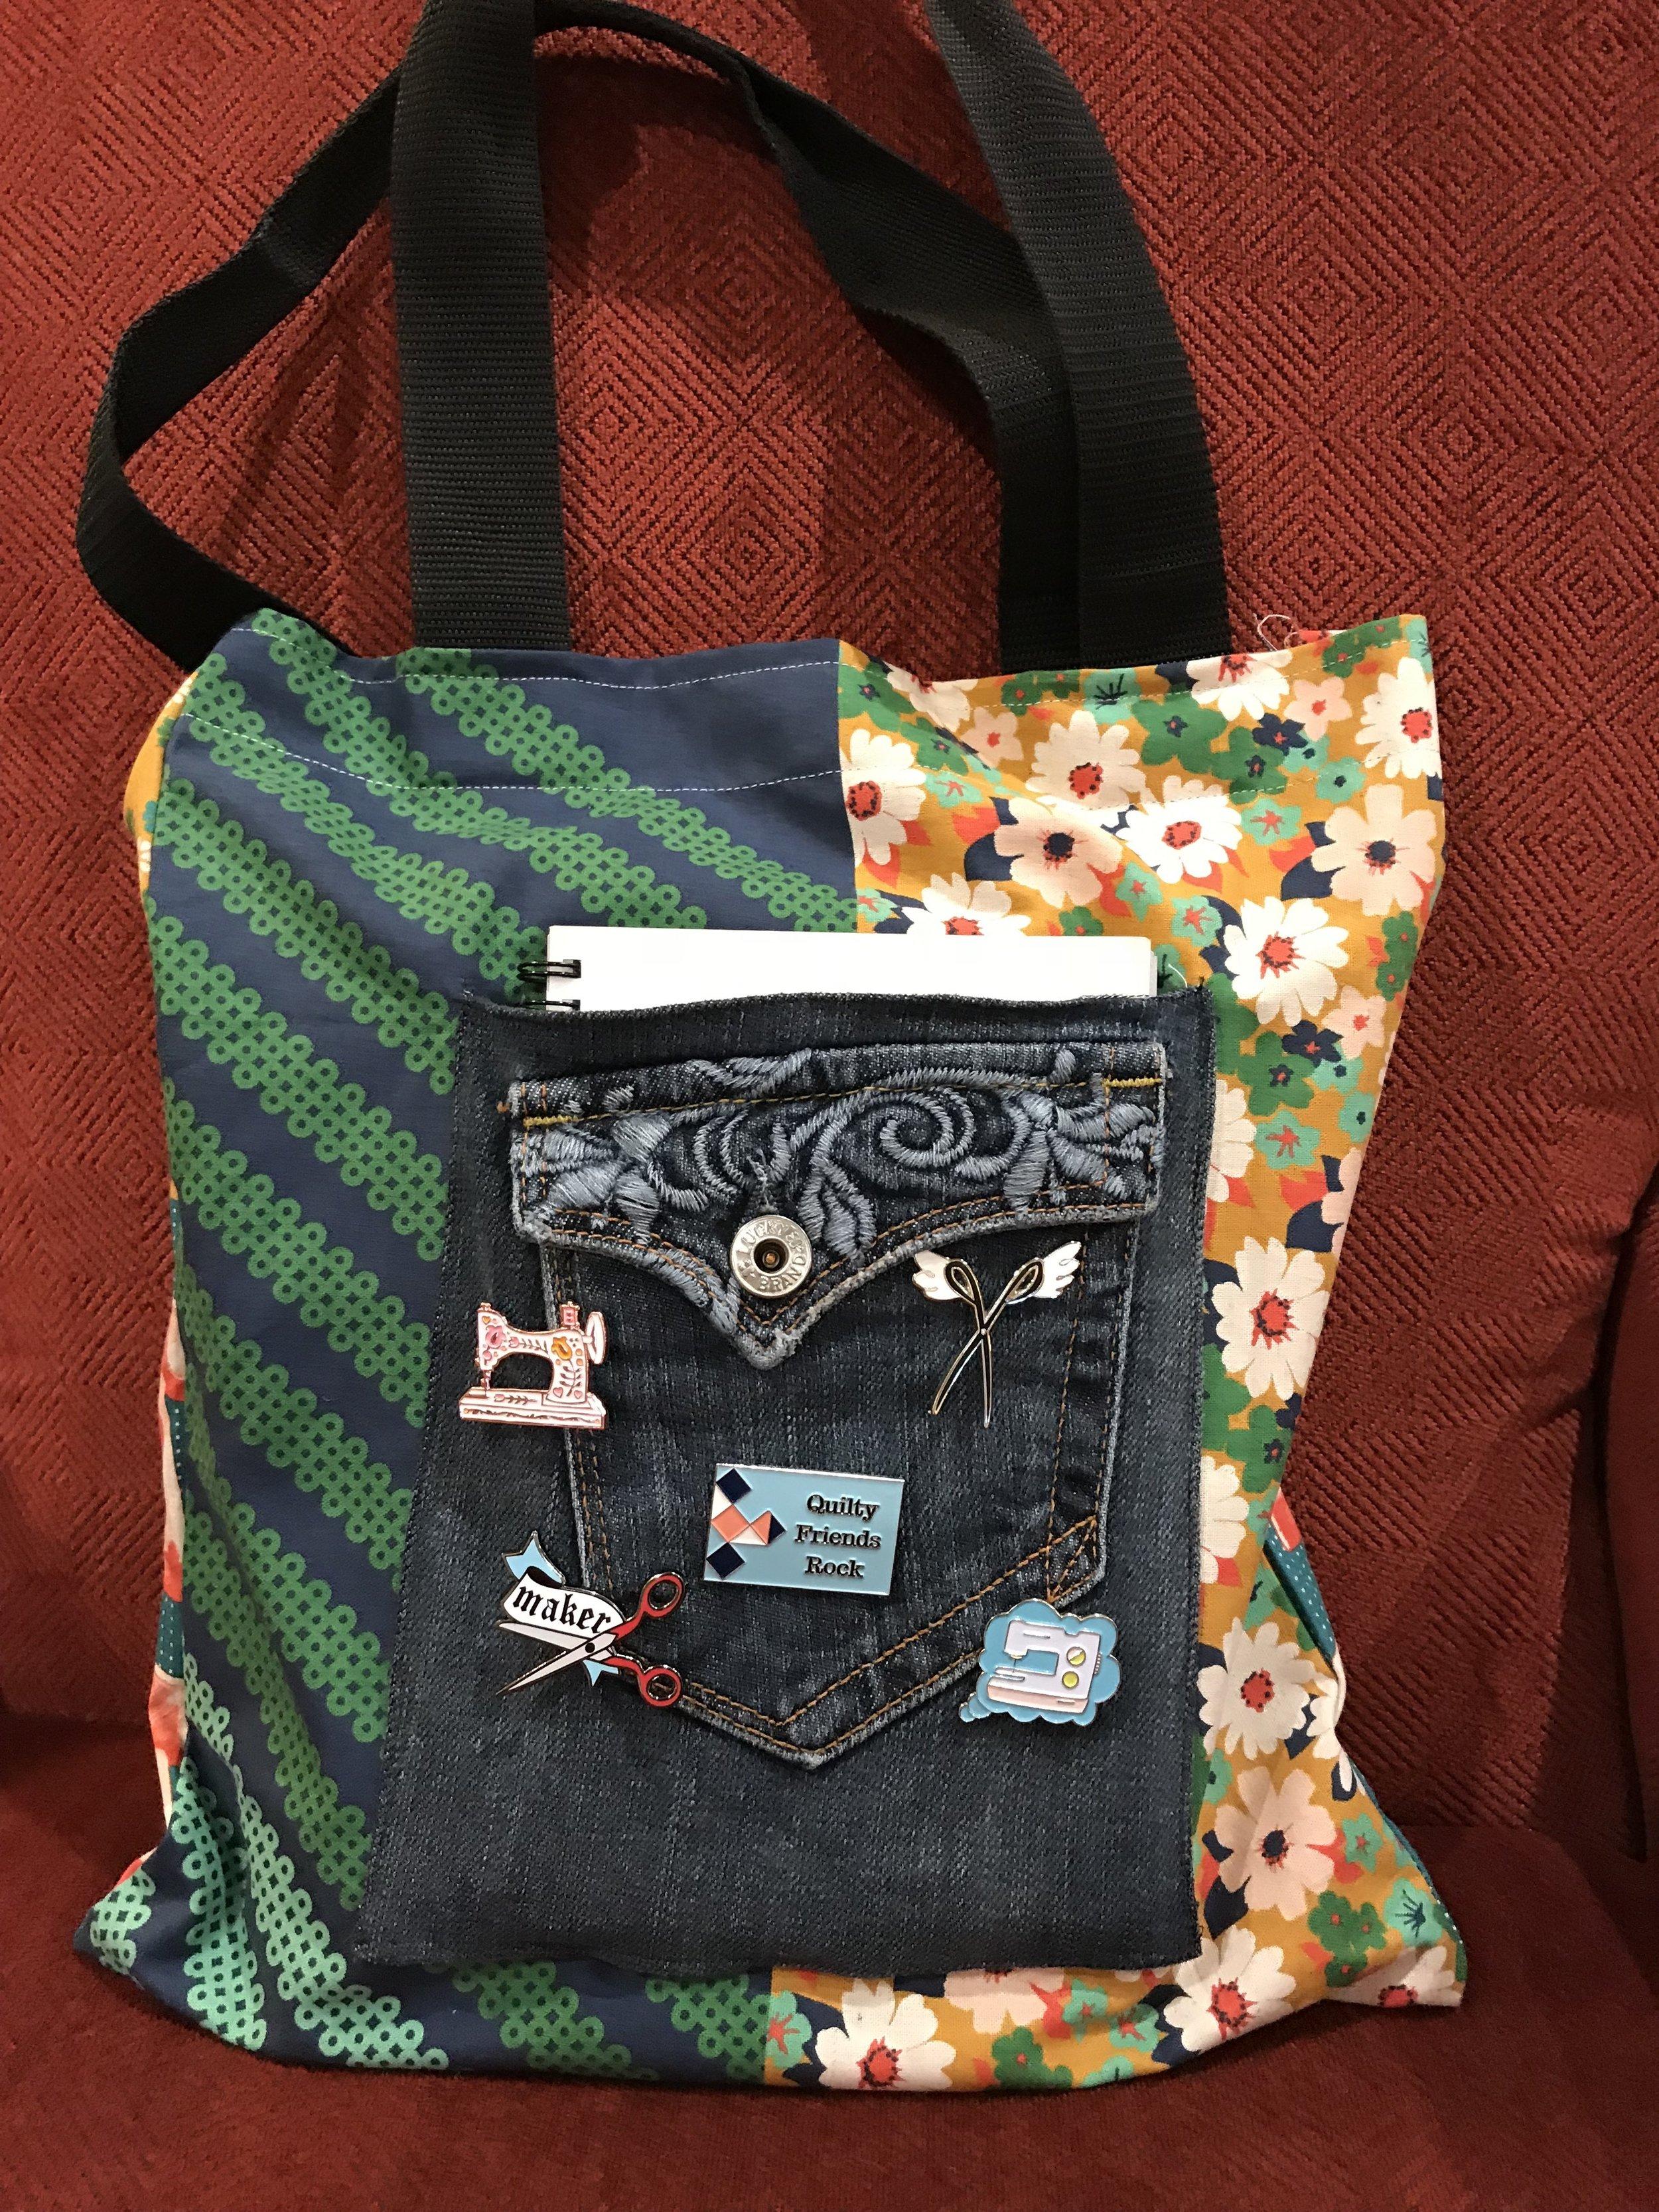 Jeans pocket on a tote bag